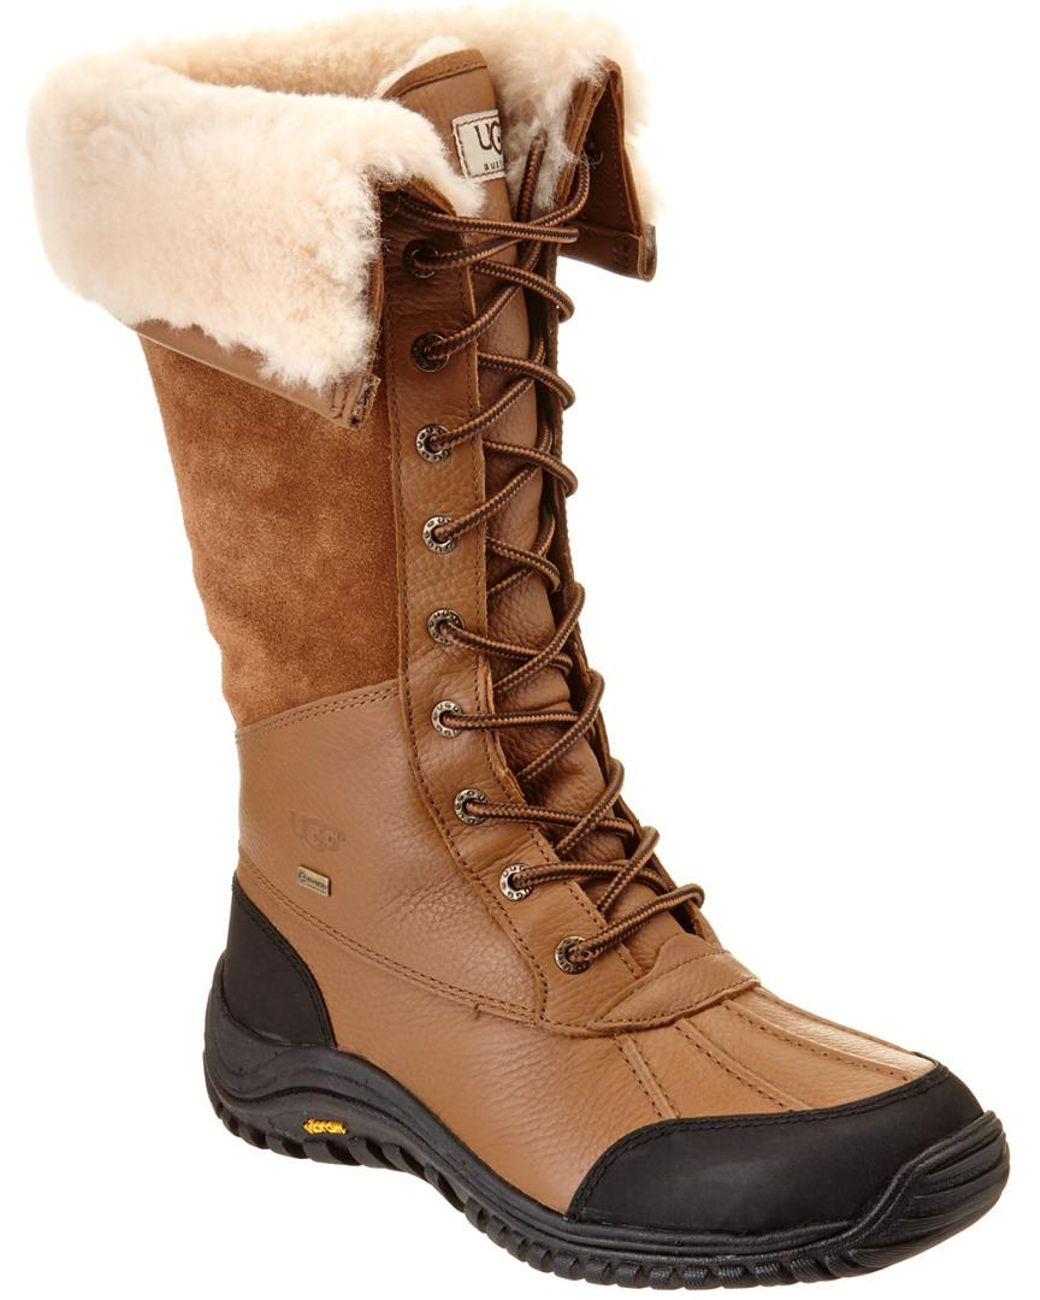 90b28281b65 Brown Women's Adirondack Waterproof Leather Tall Boot